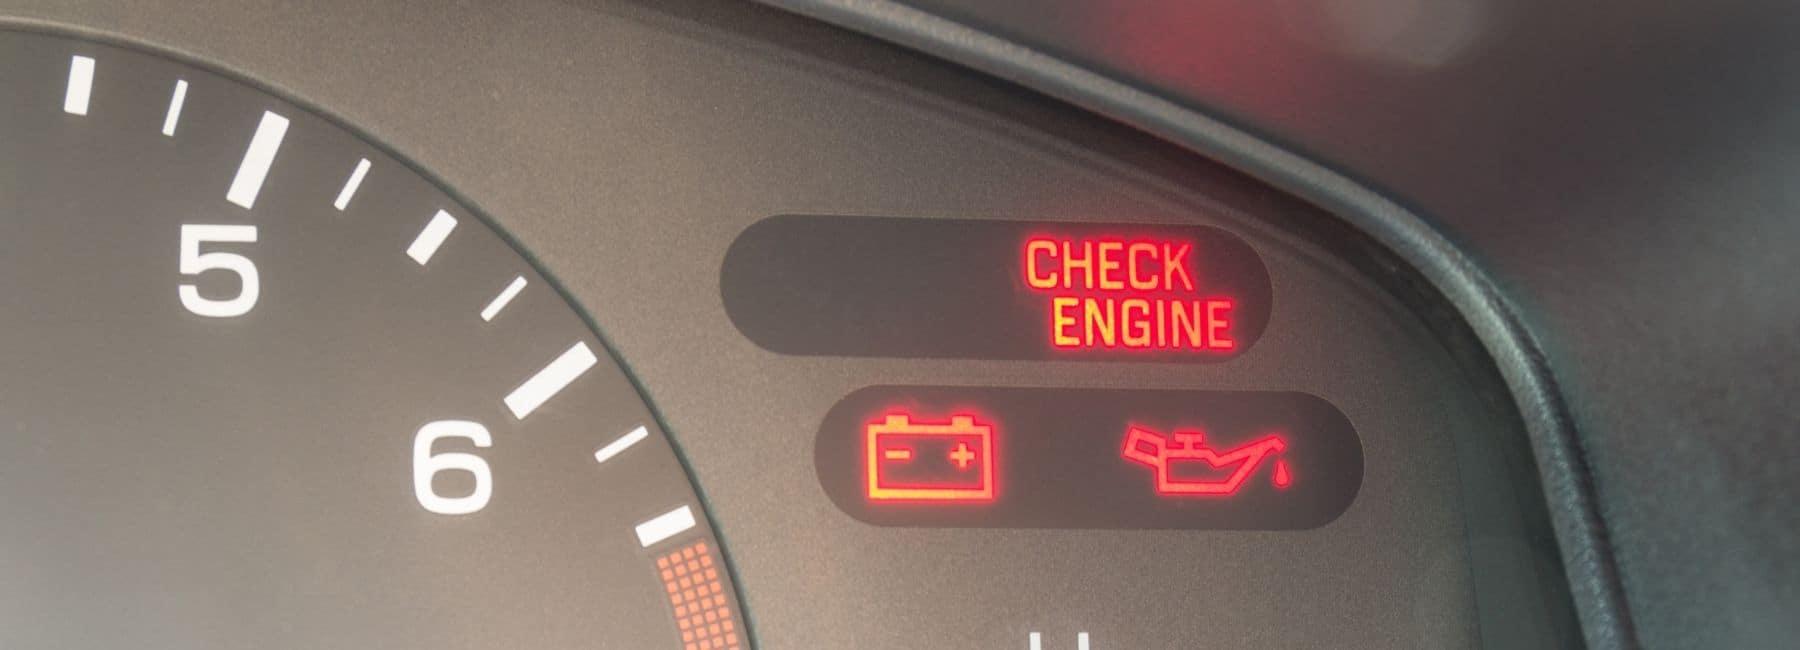 Check Engine Light | Oil Change Light | Change Battery Light | Auto Repair Near Roswell, NM